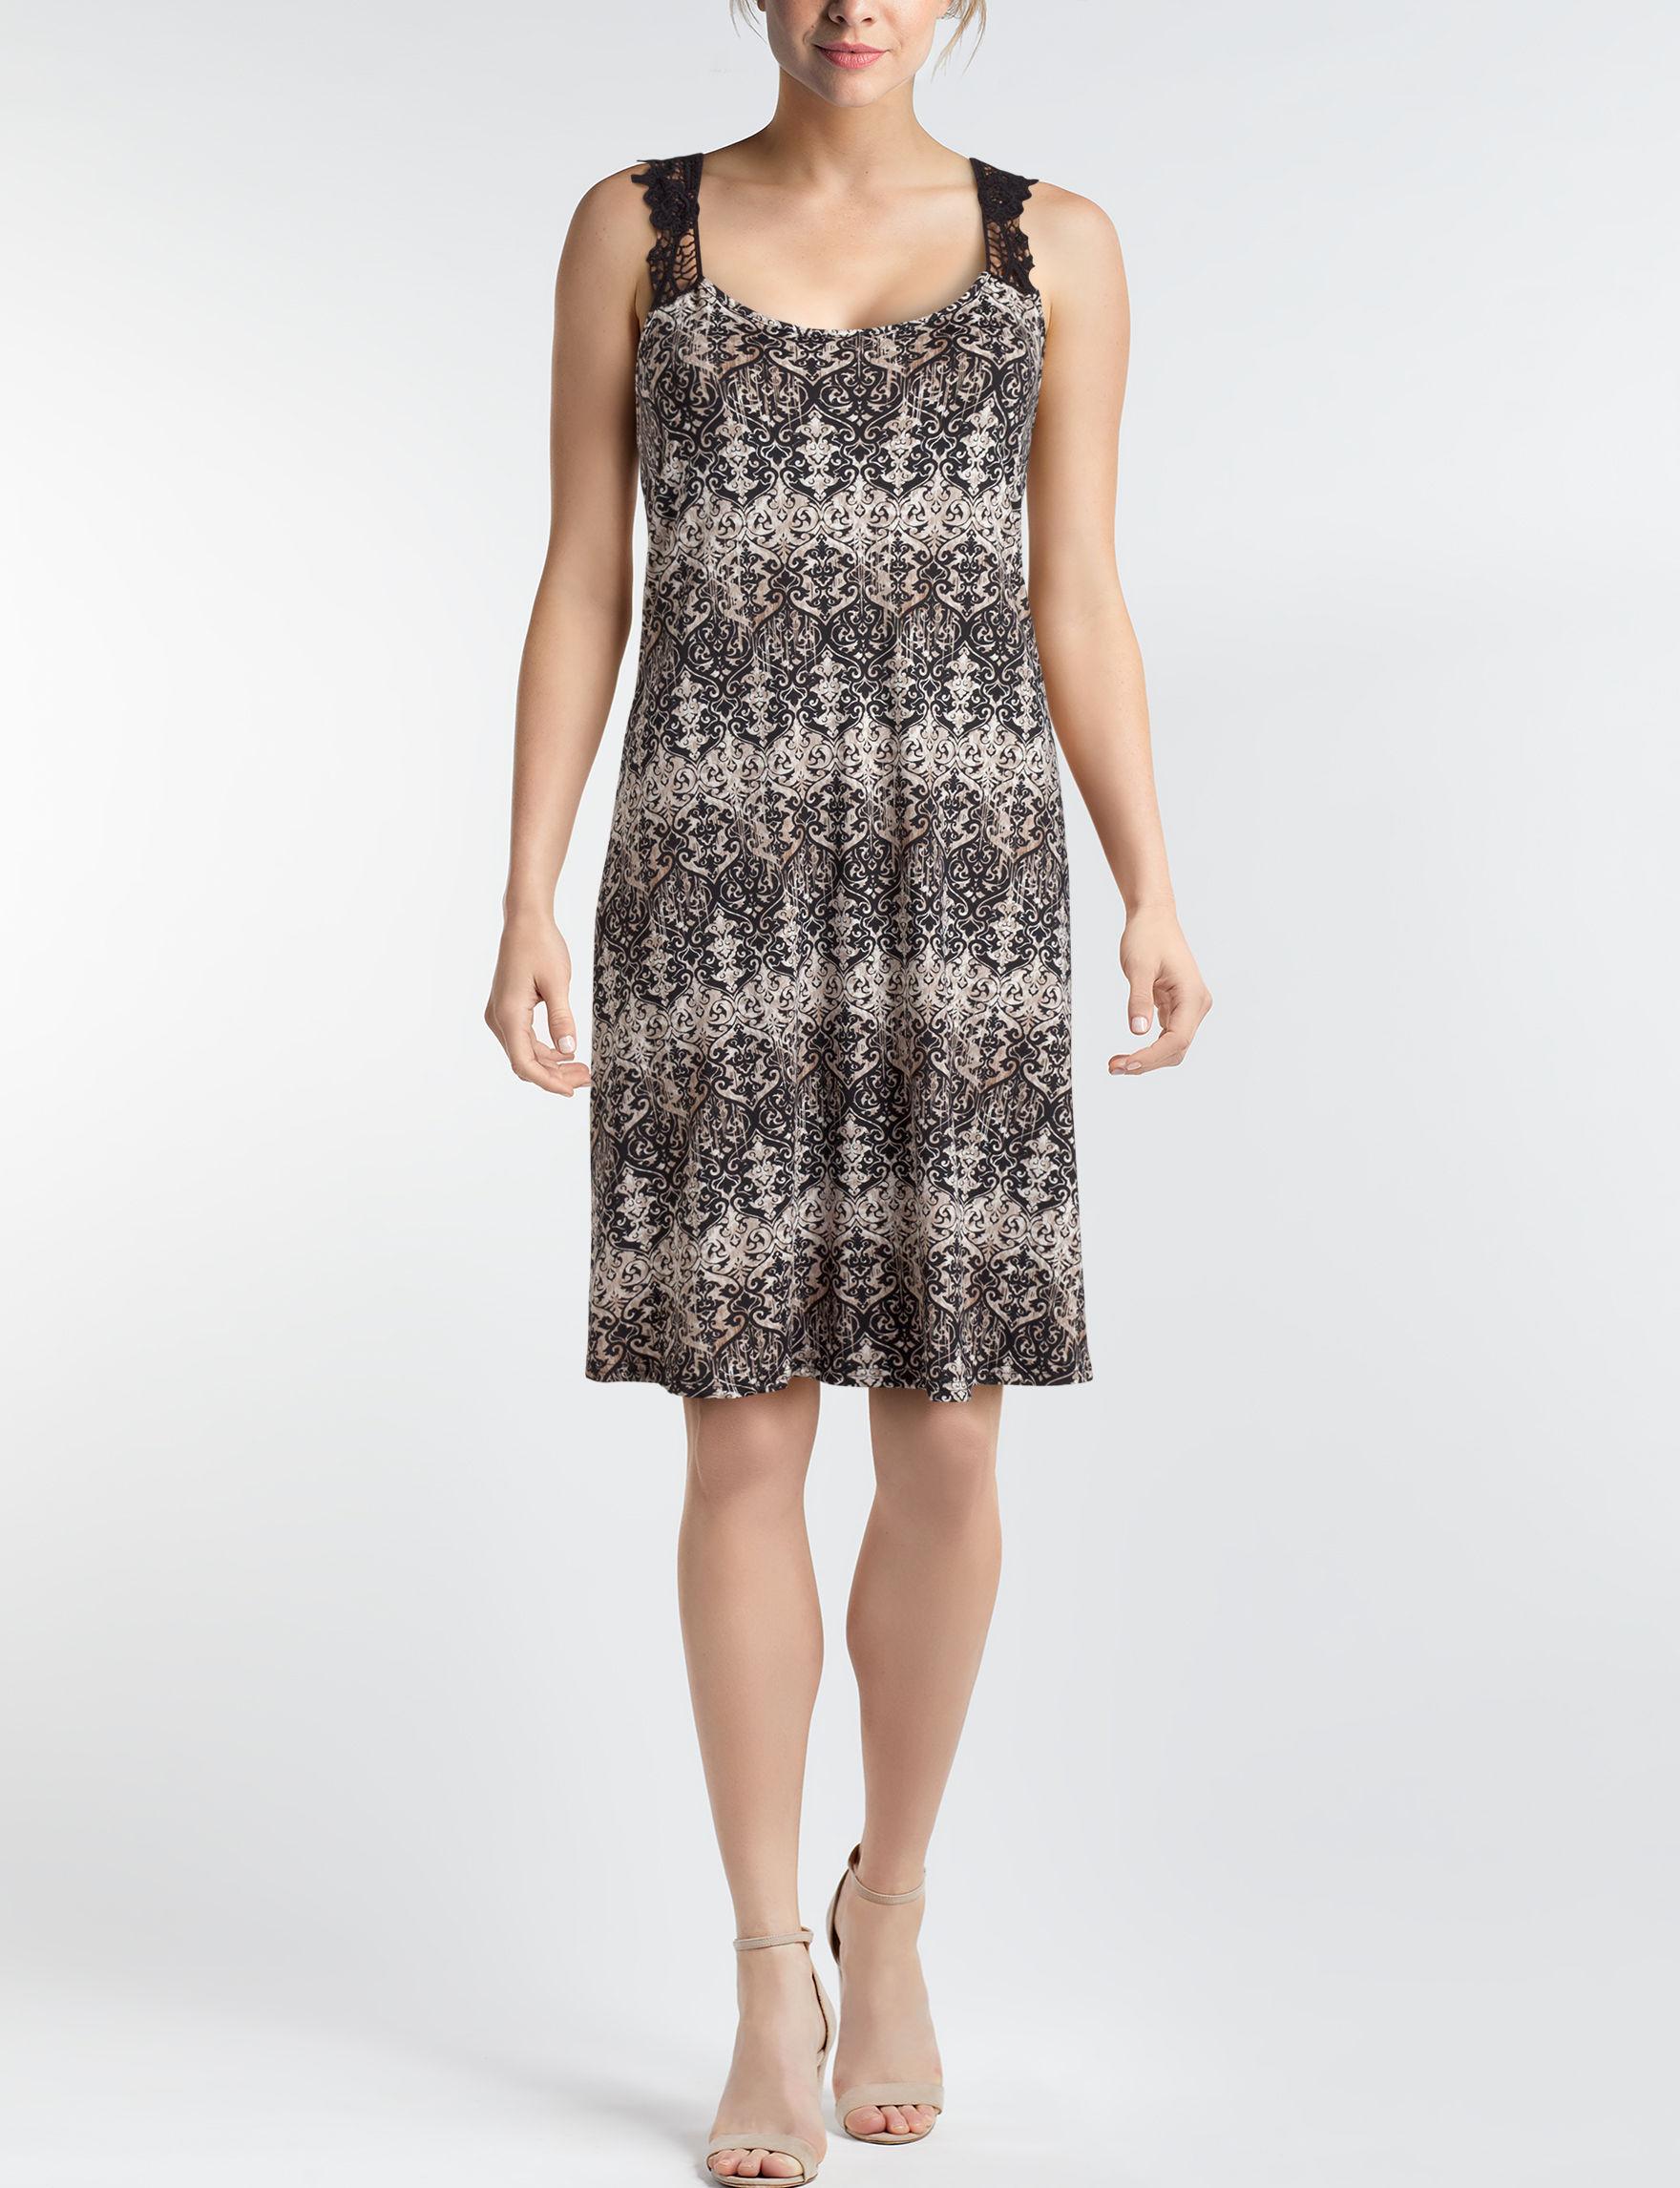 Nina Leonard Black White Everyday & Casual Fit & Flare Dresses Sundresses